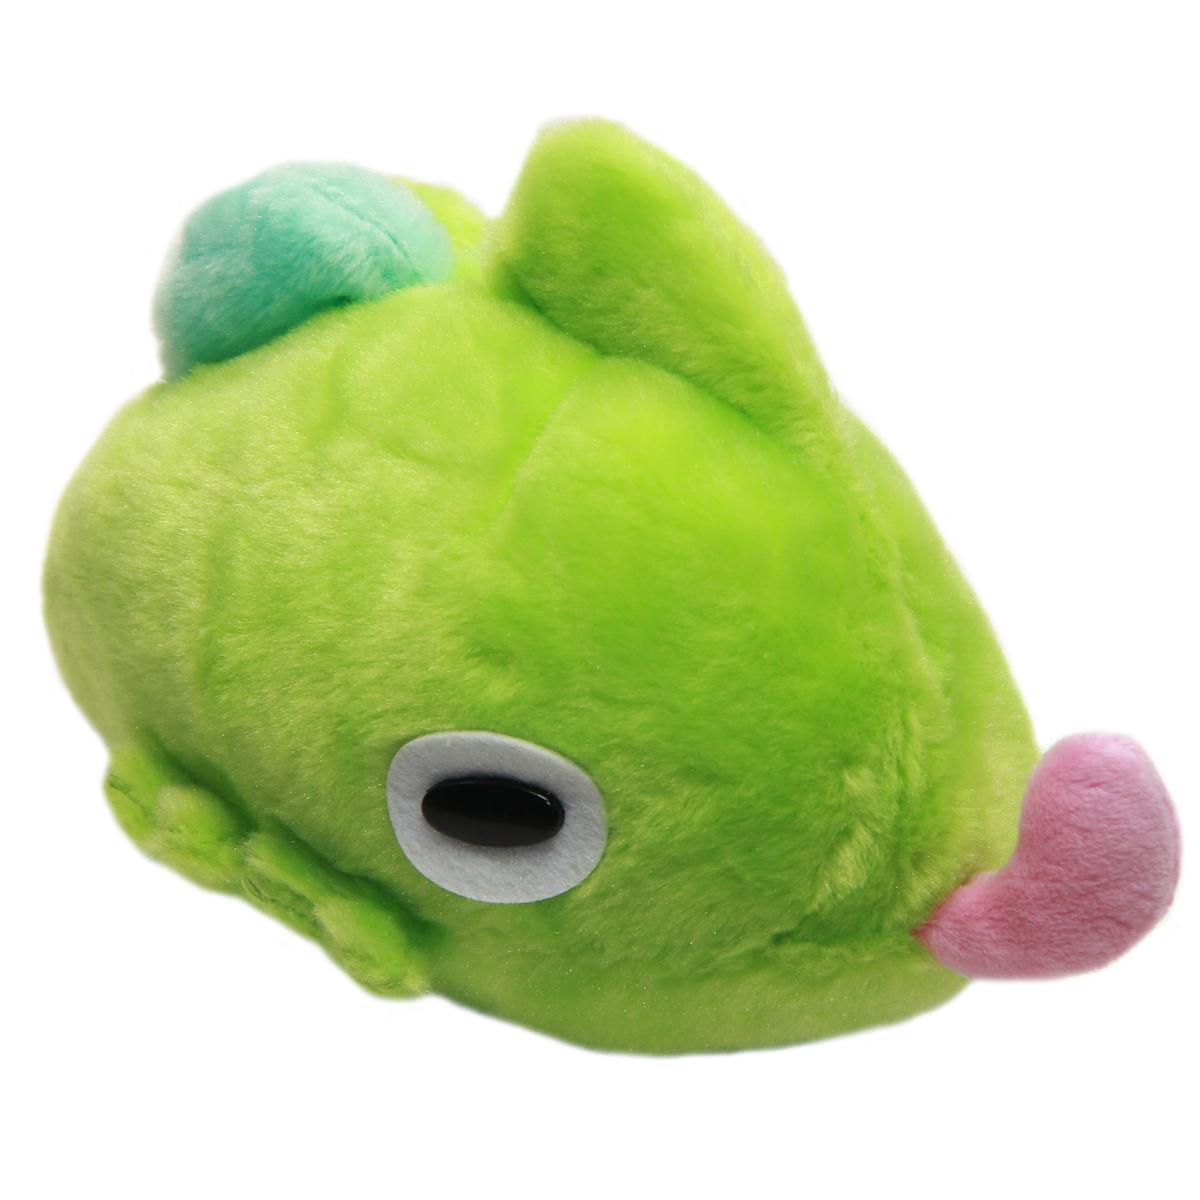 Chameleon Plush Doll Super Soft Squishy Stuffed Animal Toy Green BIG Size 17 Inches